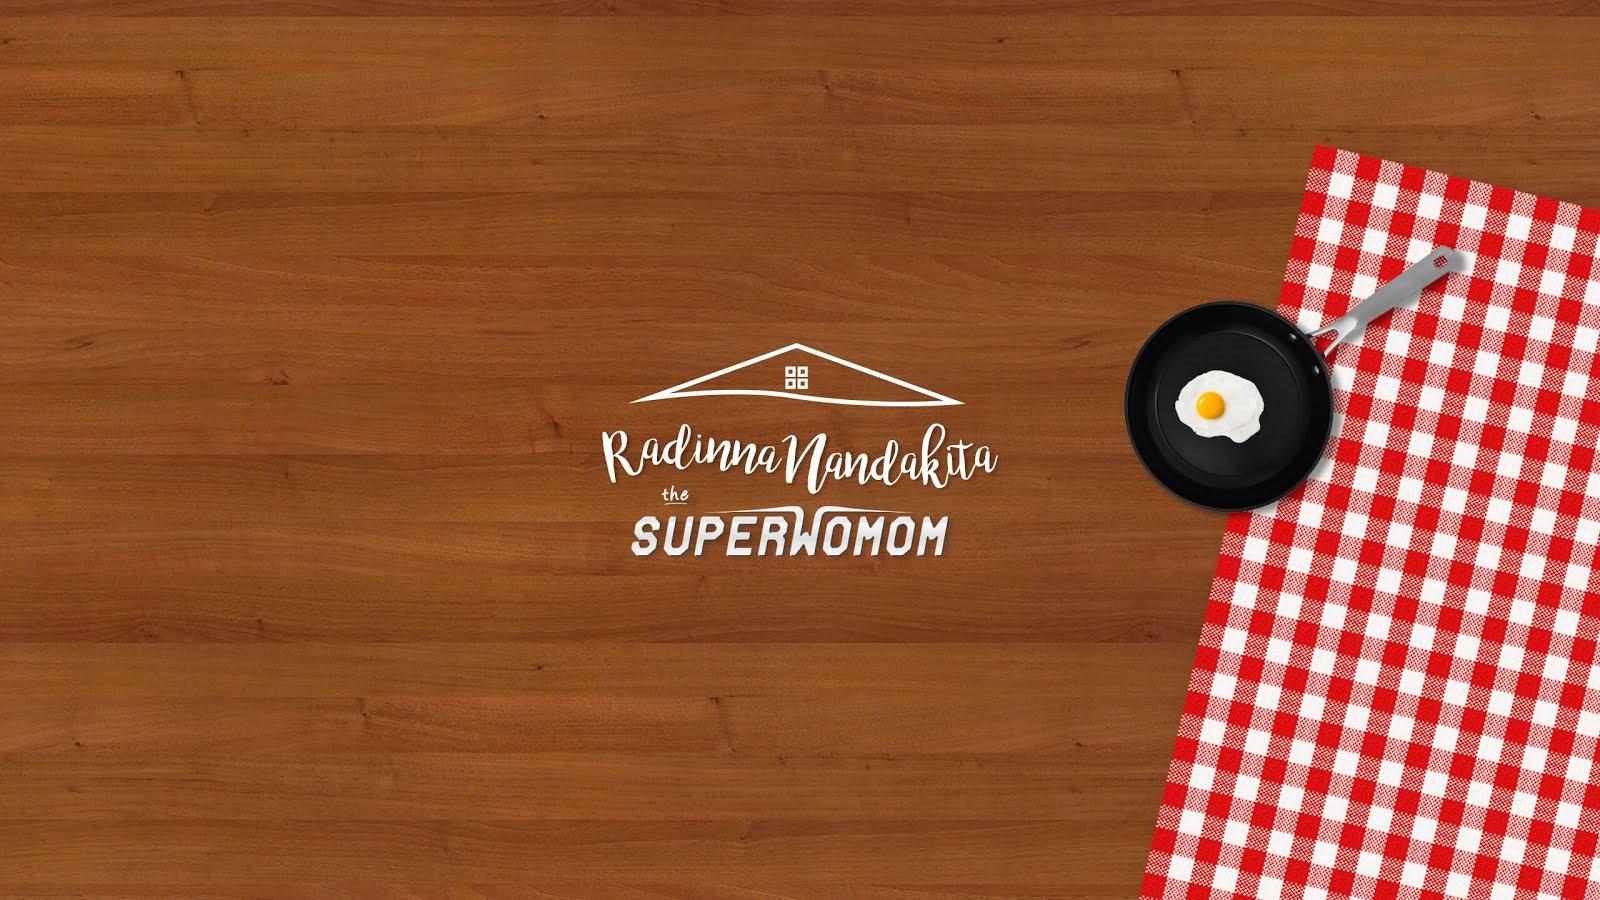 THE SUPERWOMOM